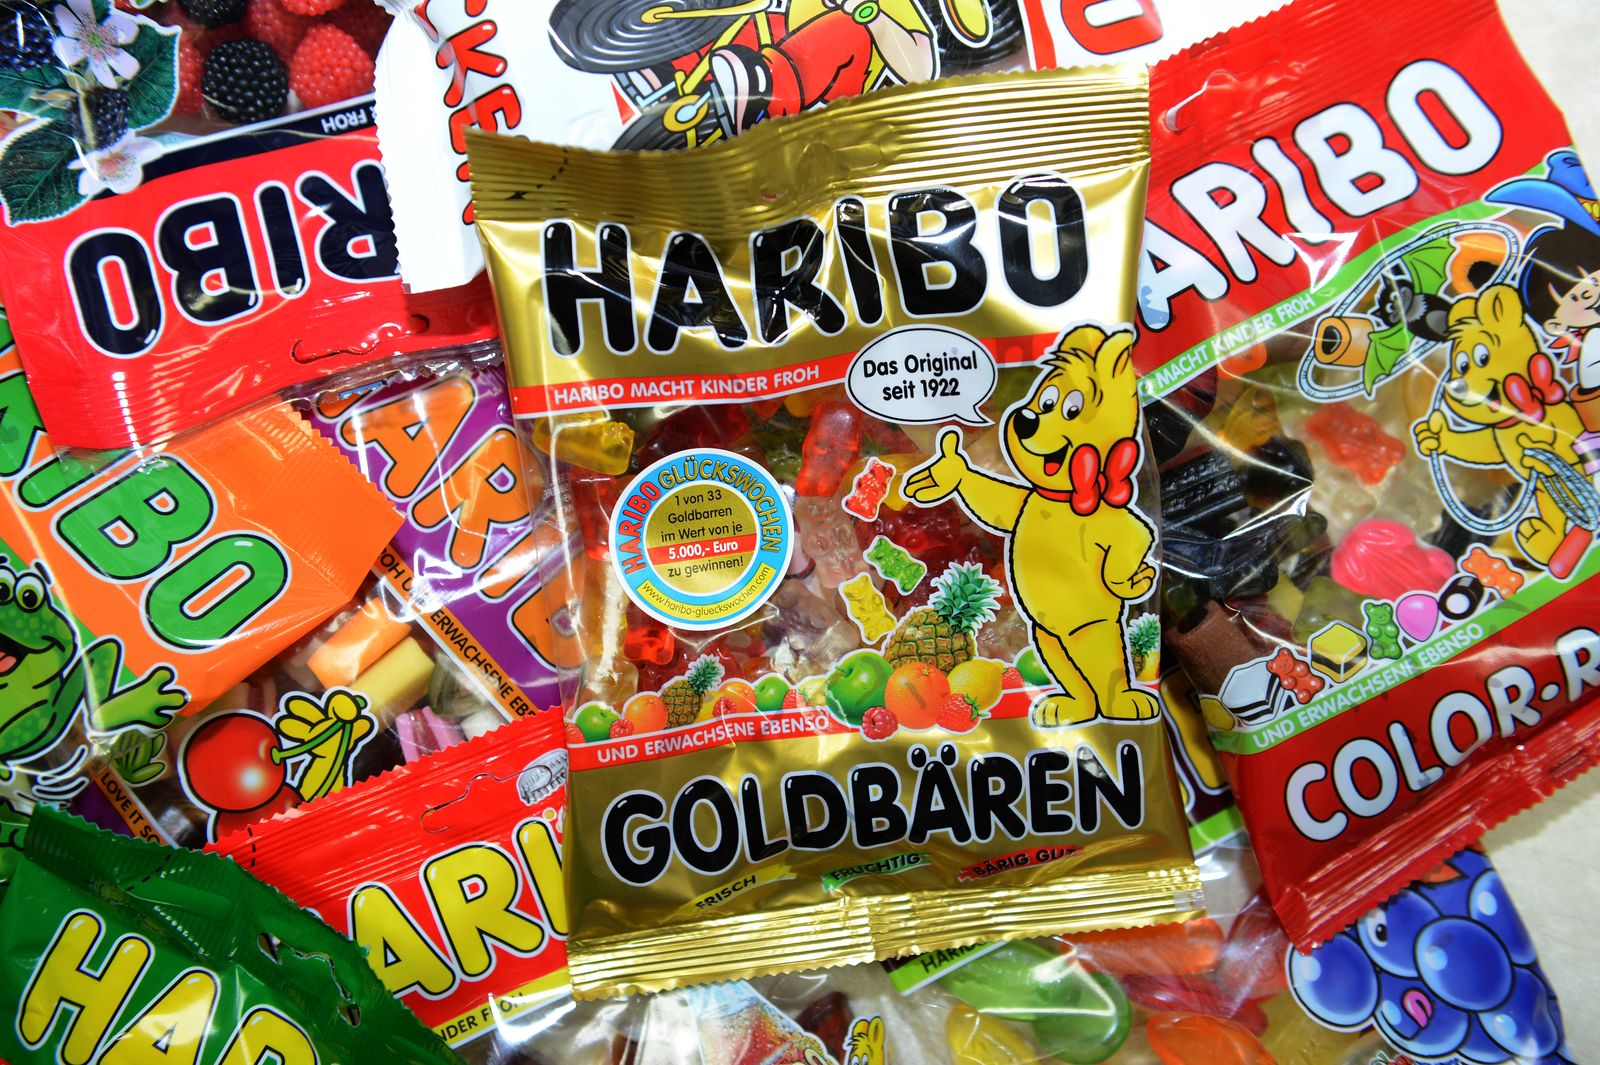 Haribo / Gummibärchen